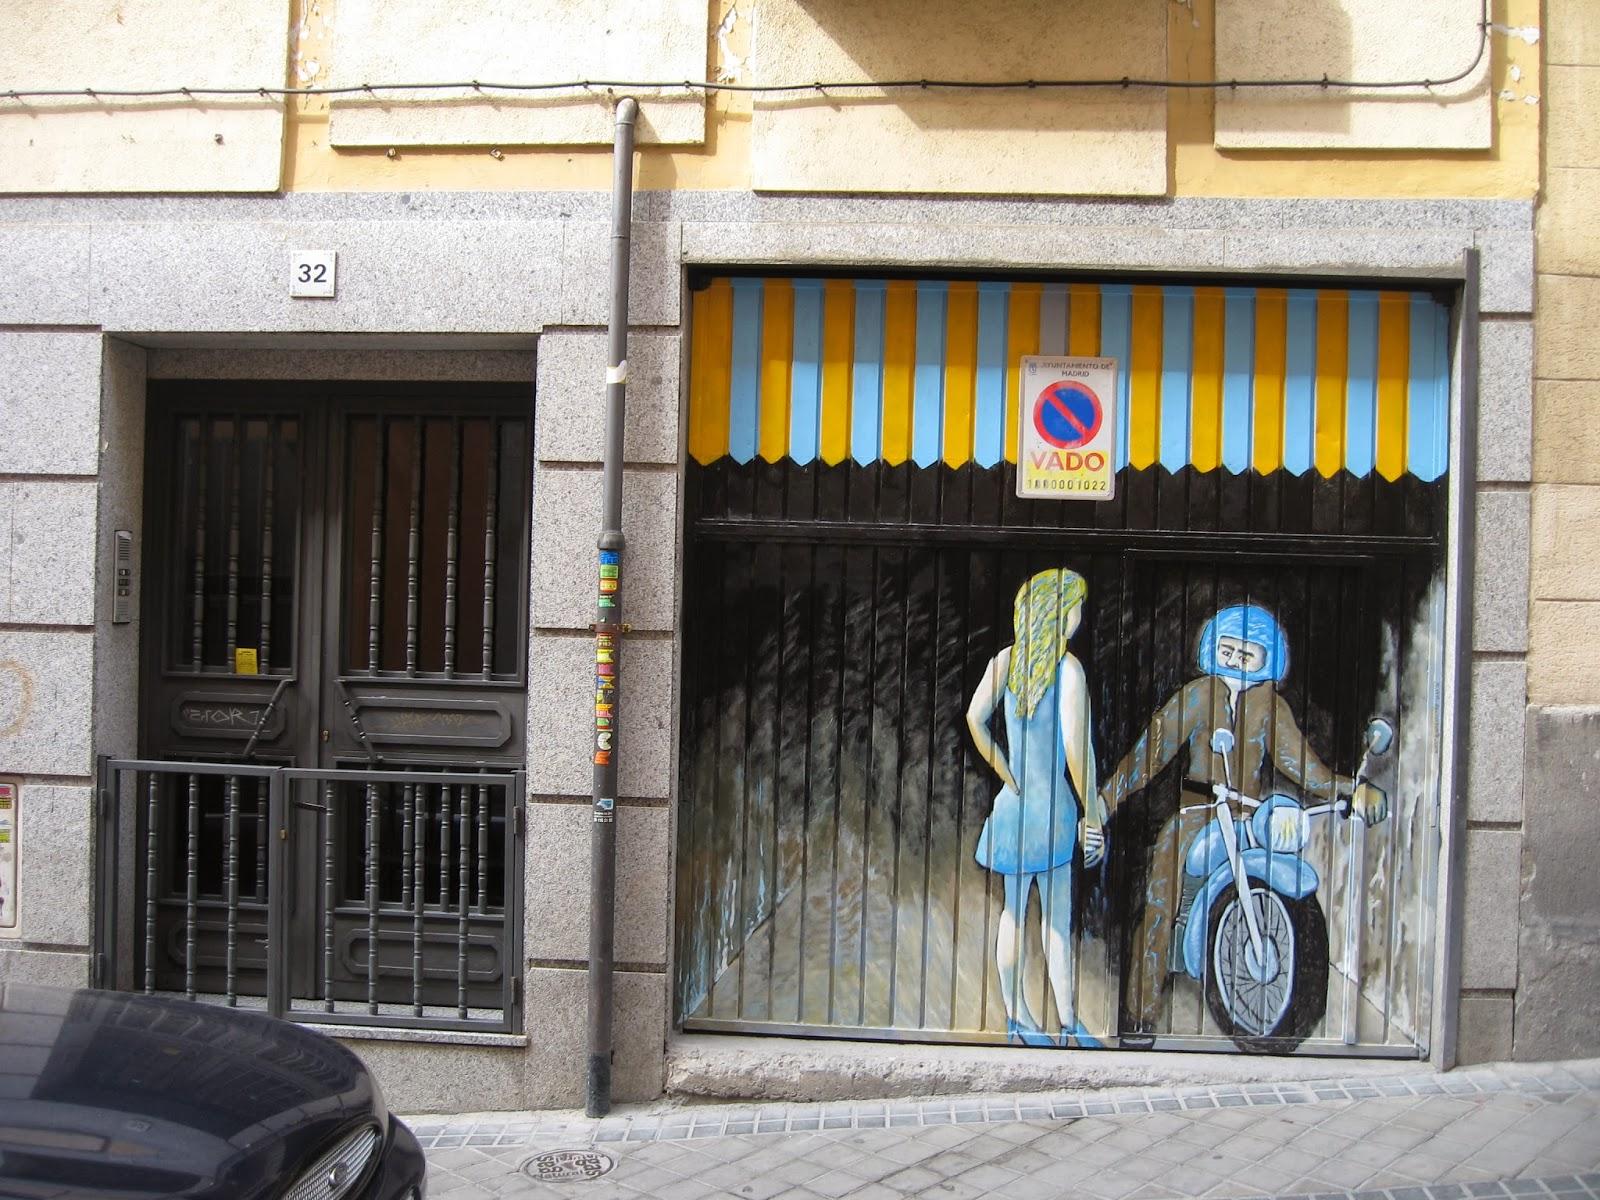 1 c mo pintar un mural en la puerta de un garaje - Pintura de garaje ...